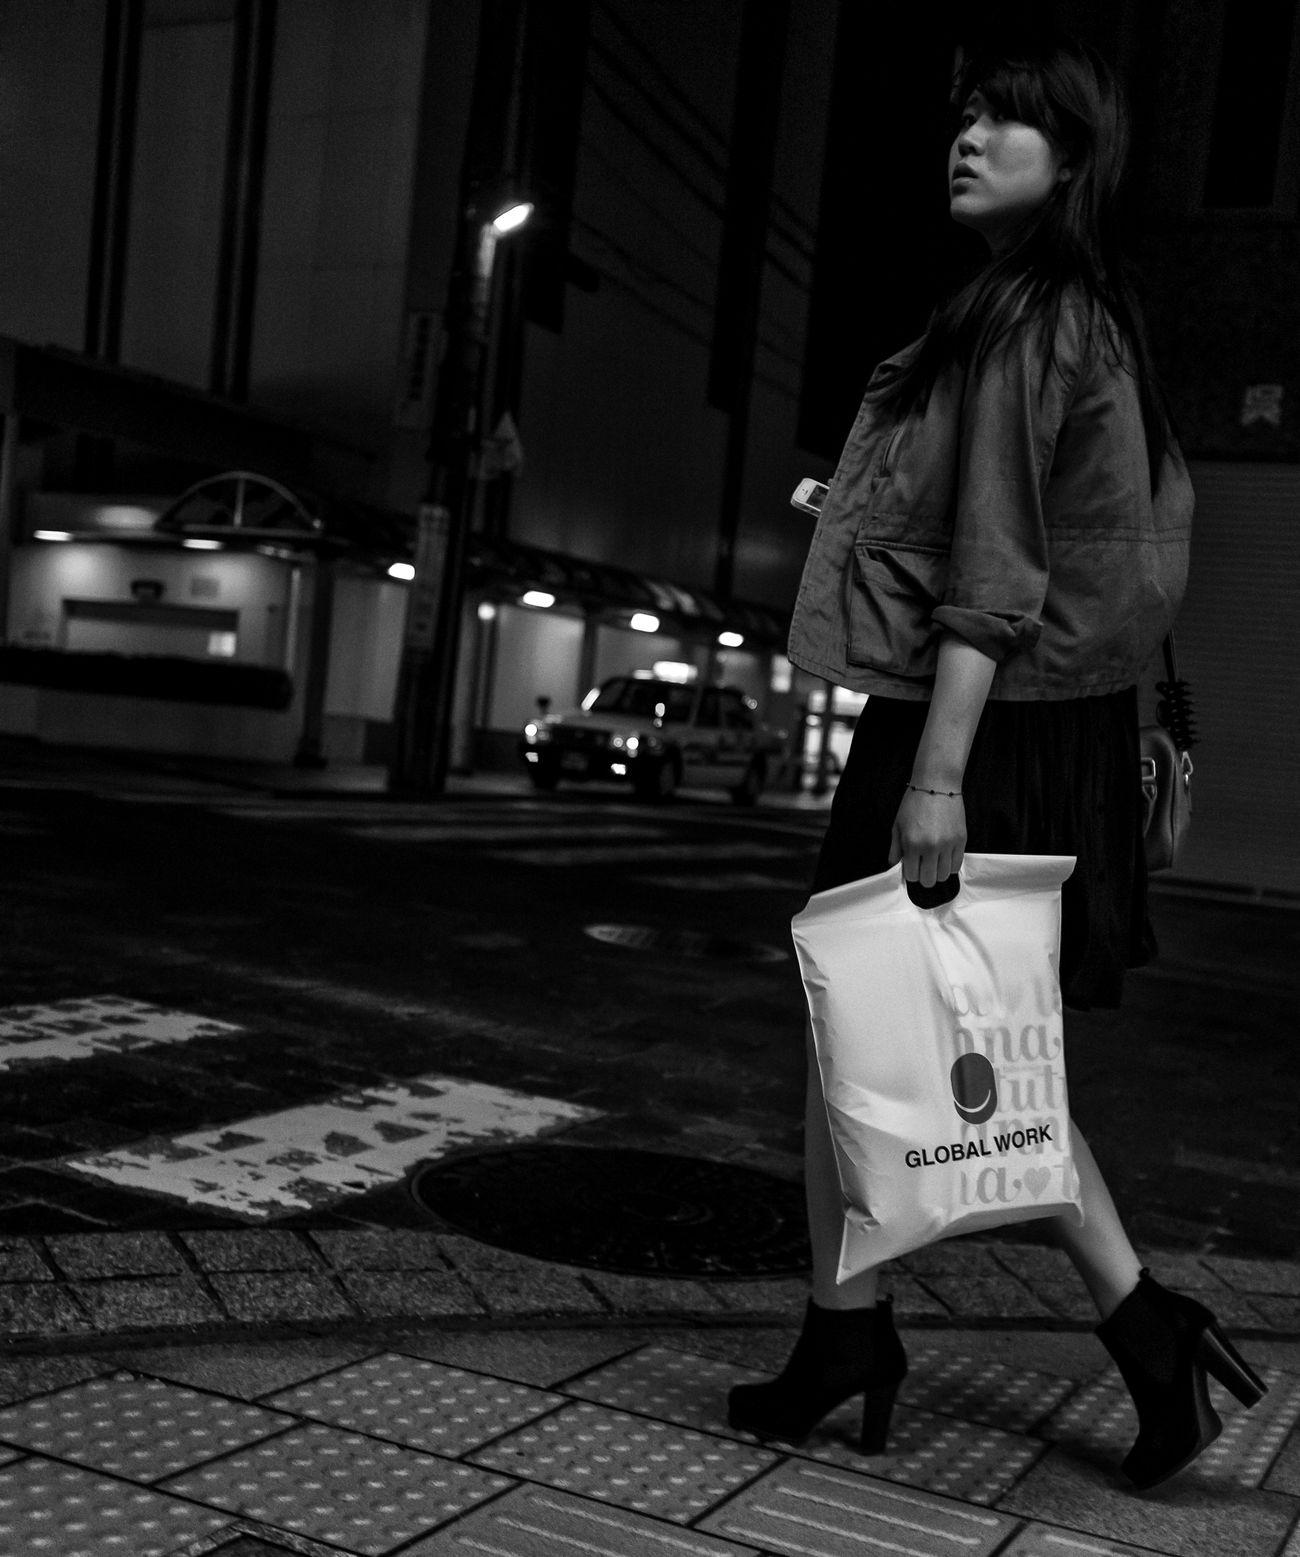 Global Work Japan Japanese  ASIA Streetphotography Fashion Street City Night FujiX100S Blackandwhite